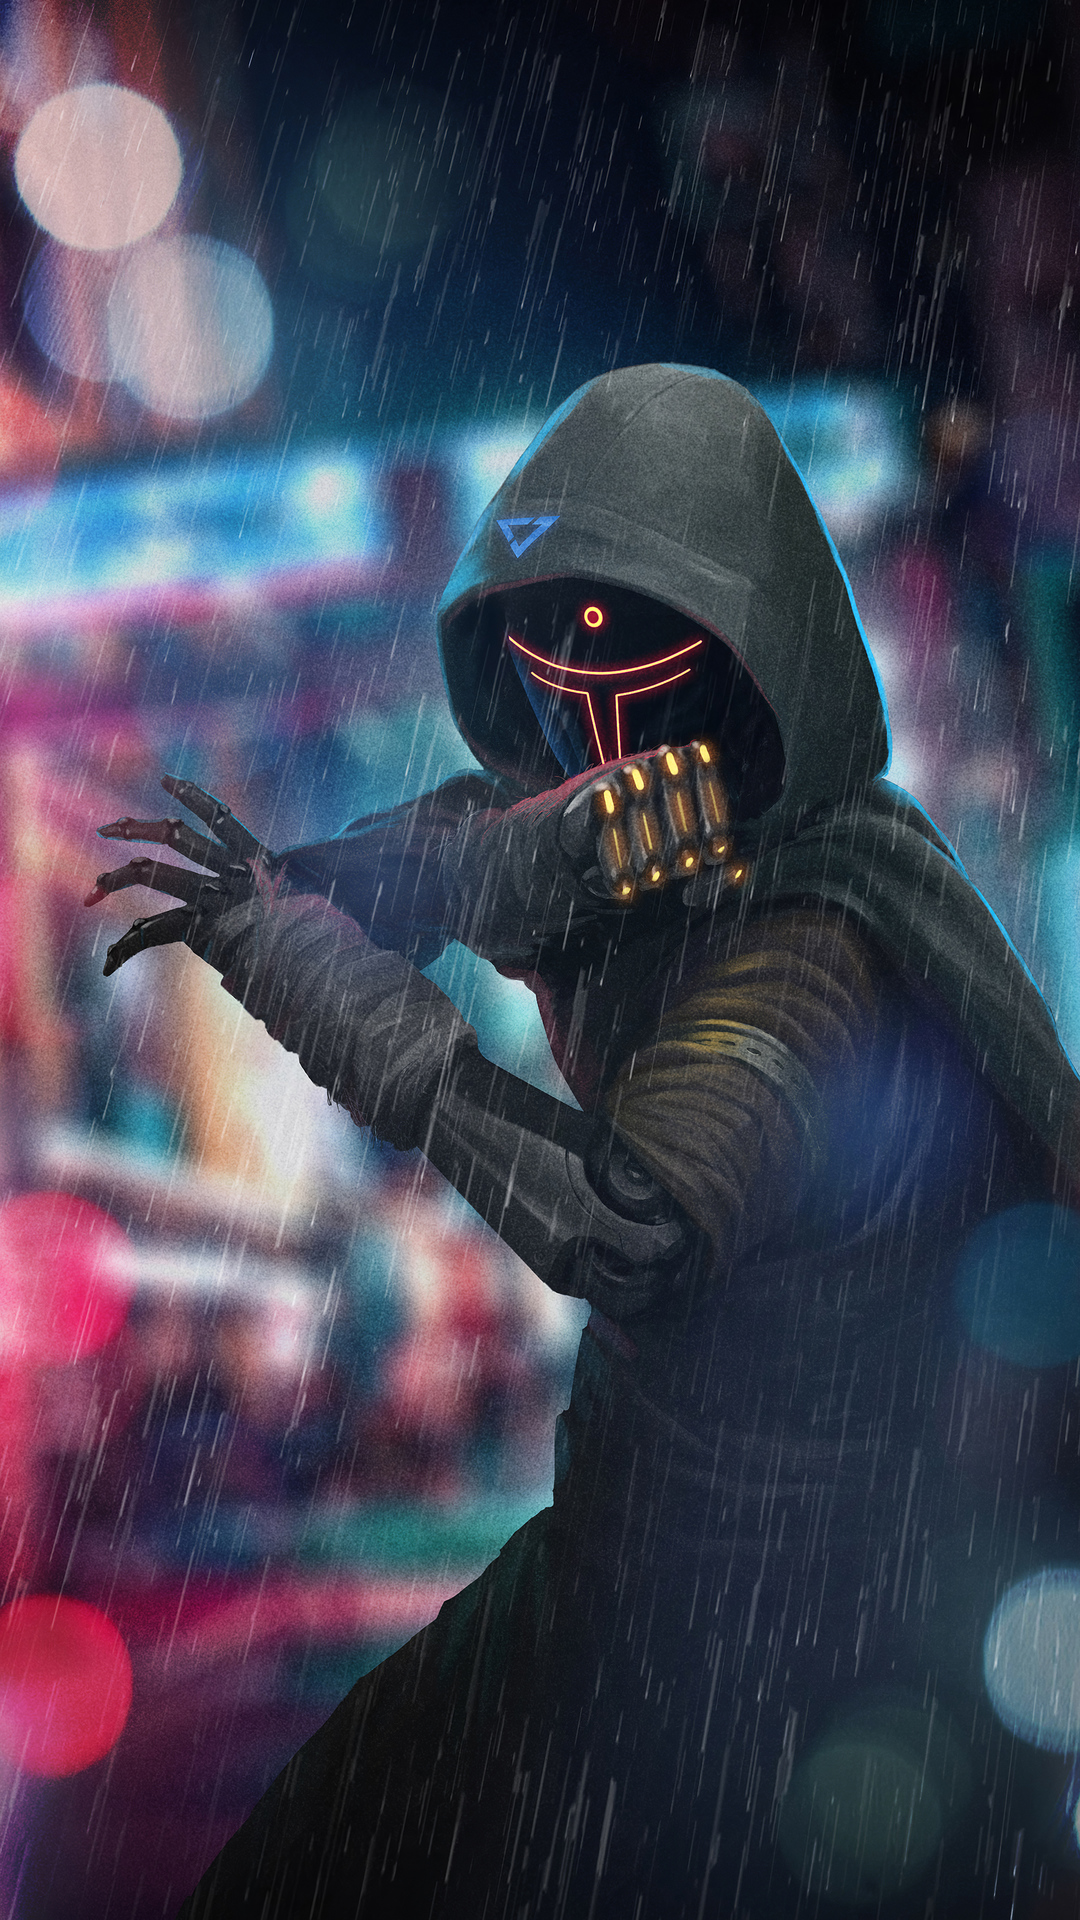 Cyberpunk Ninja HD Wallpaper 1080x1920